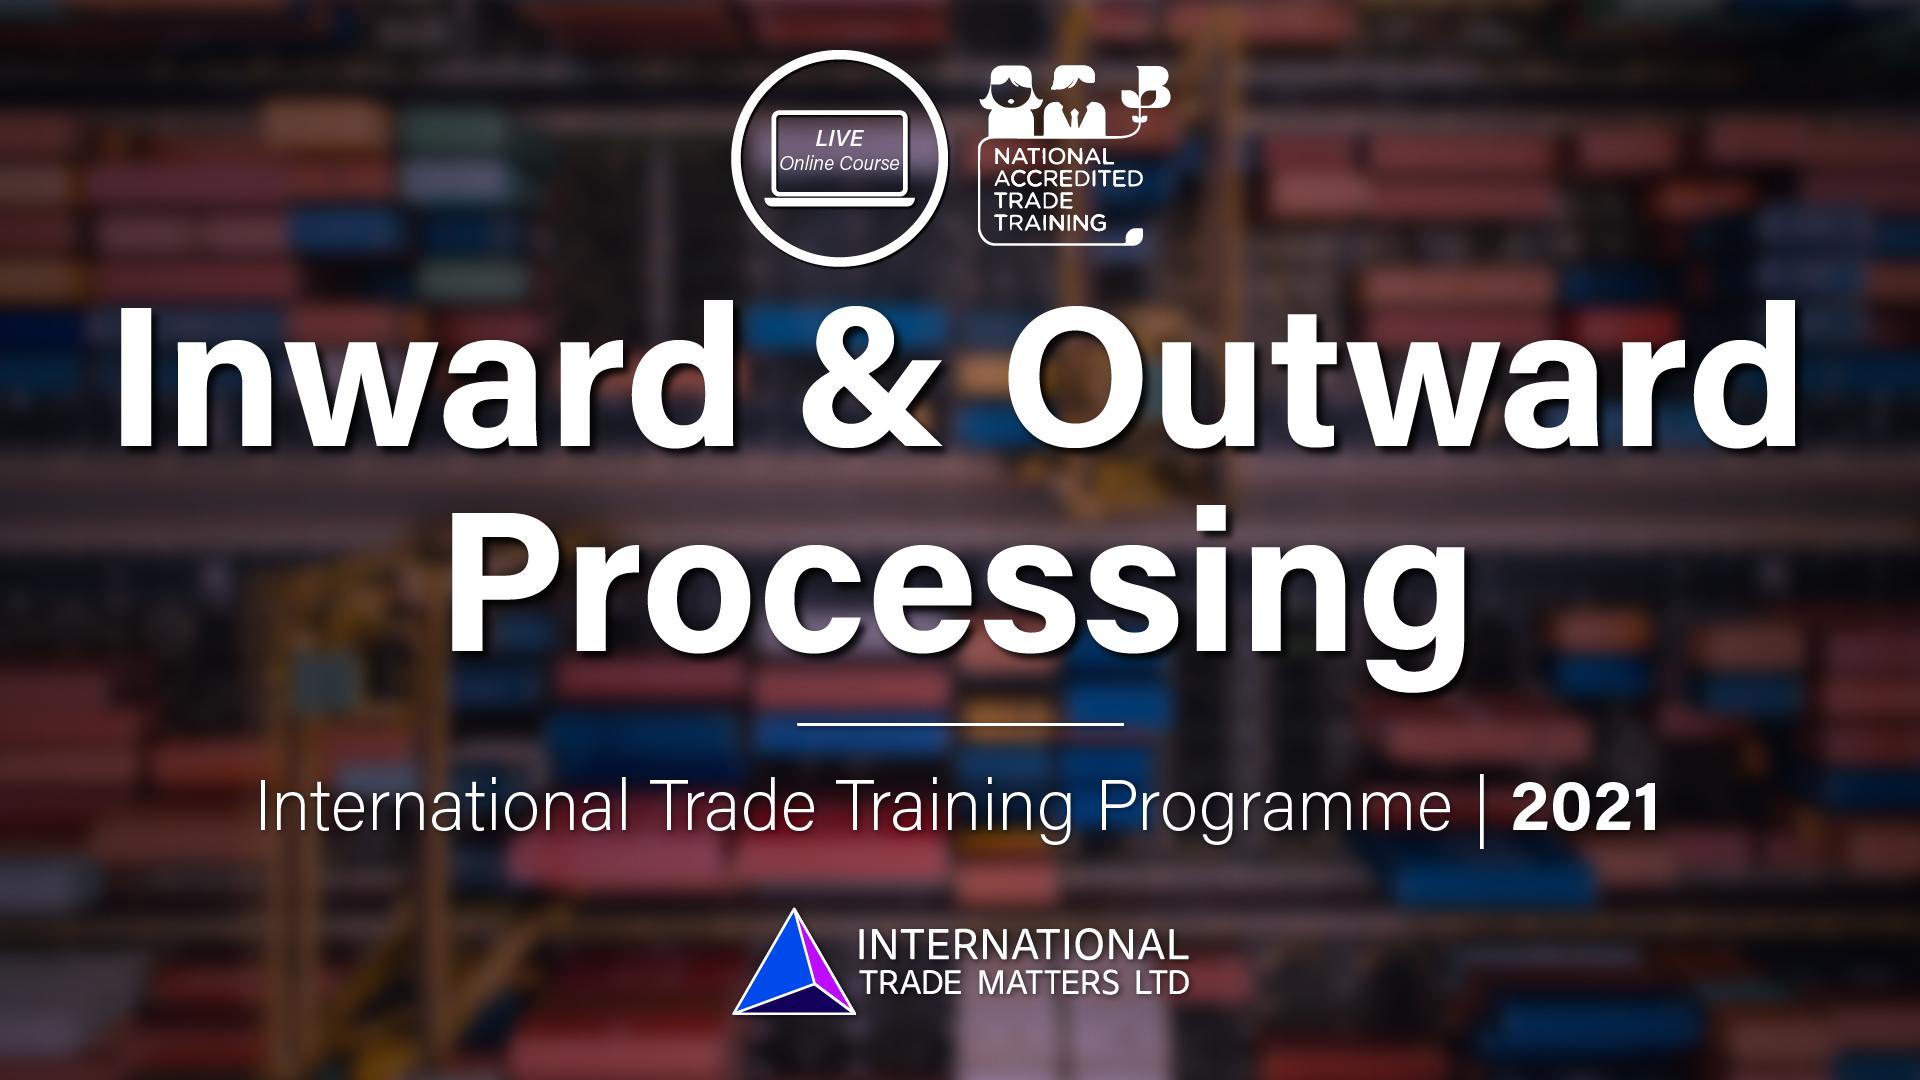 Inward & Outward Processing - An Online Course